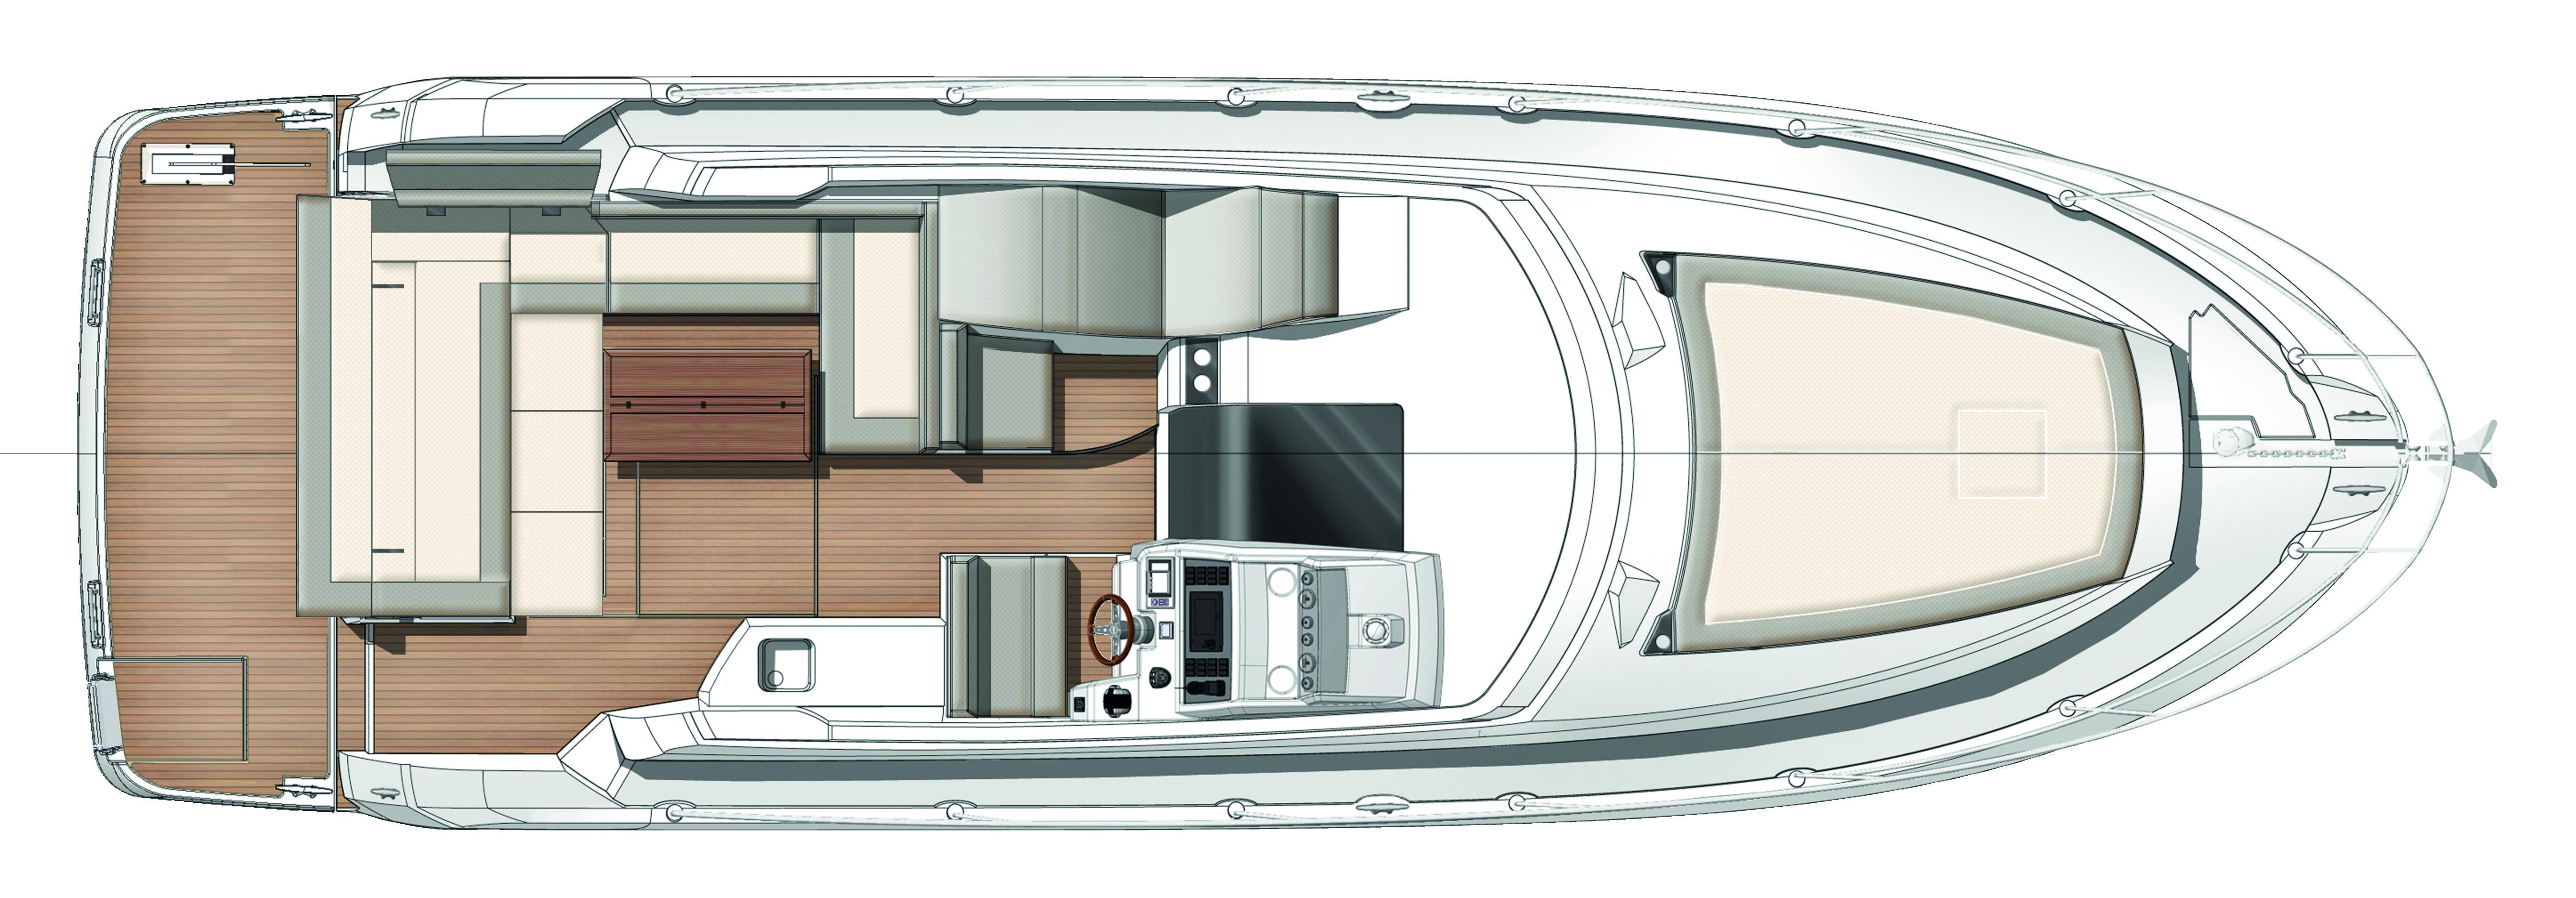 LD36-Pont-EU-Cockpit-Lounge-2-